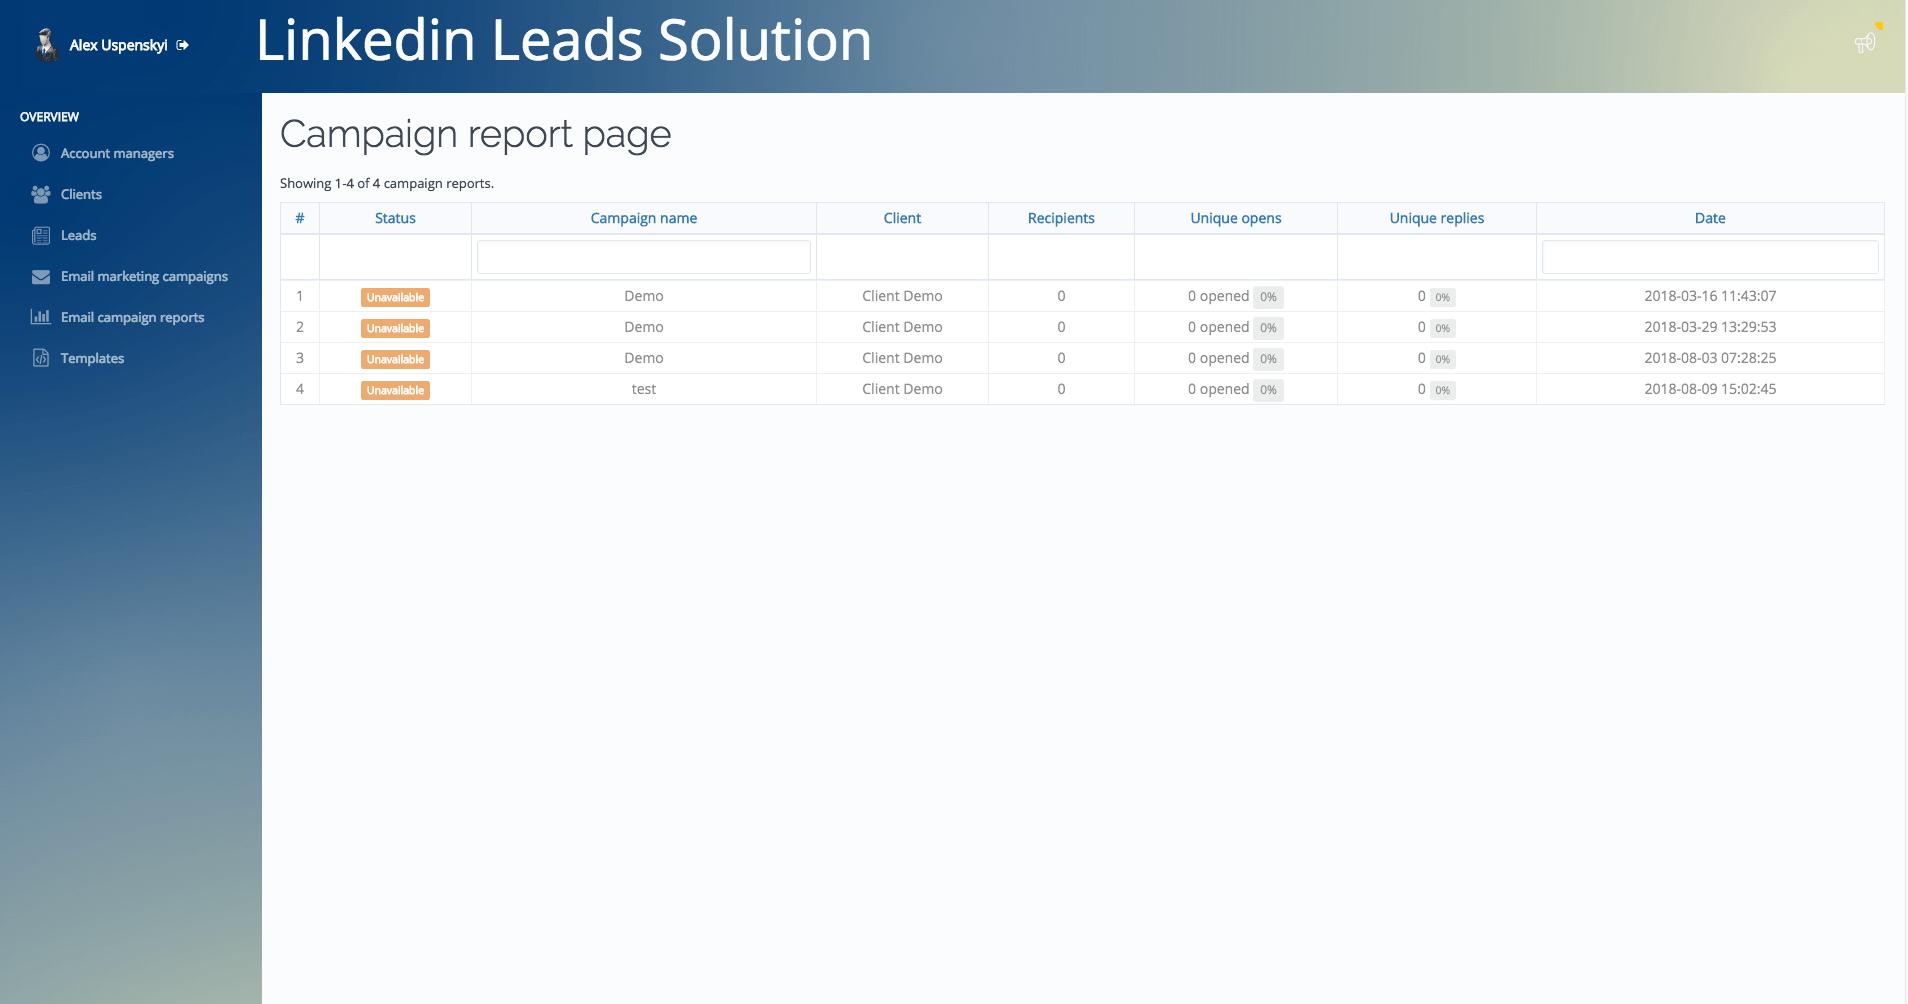 linkedin-leads-solution5b6c585d652fec1ddac9711d